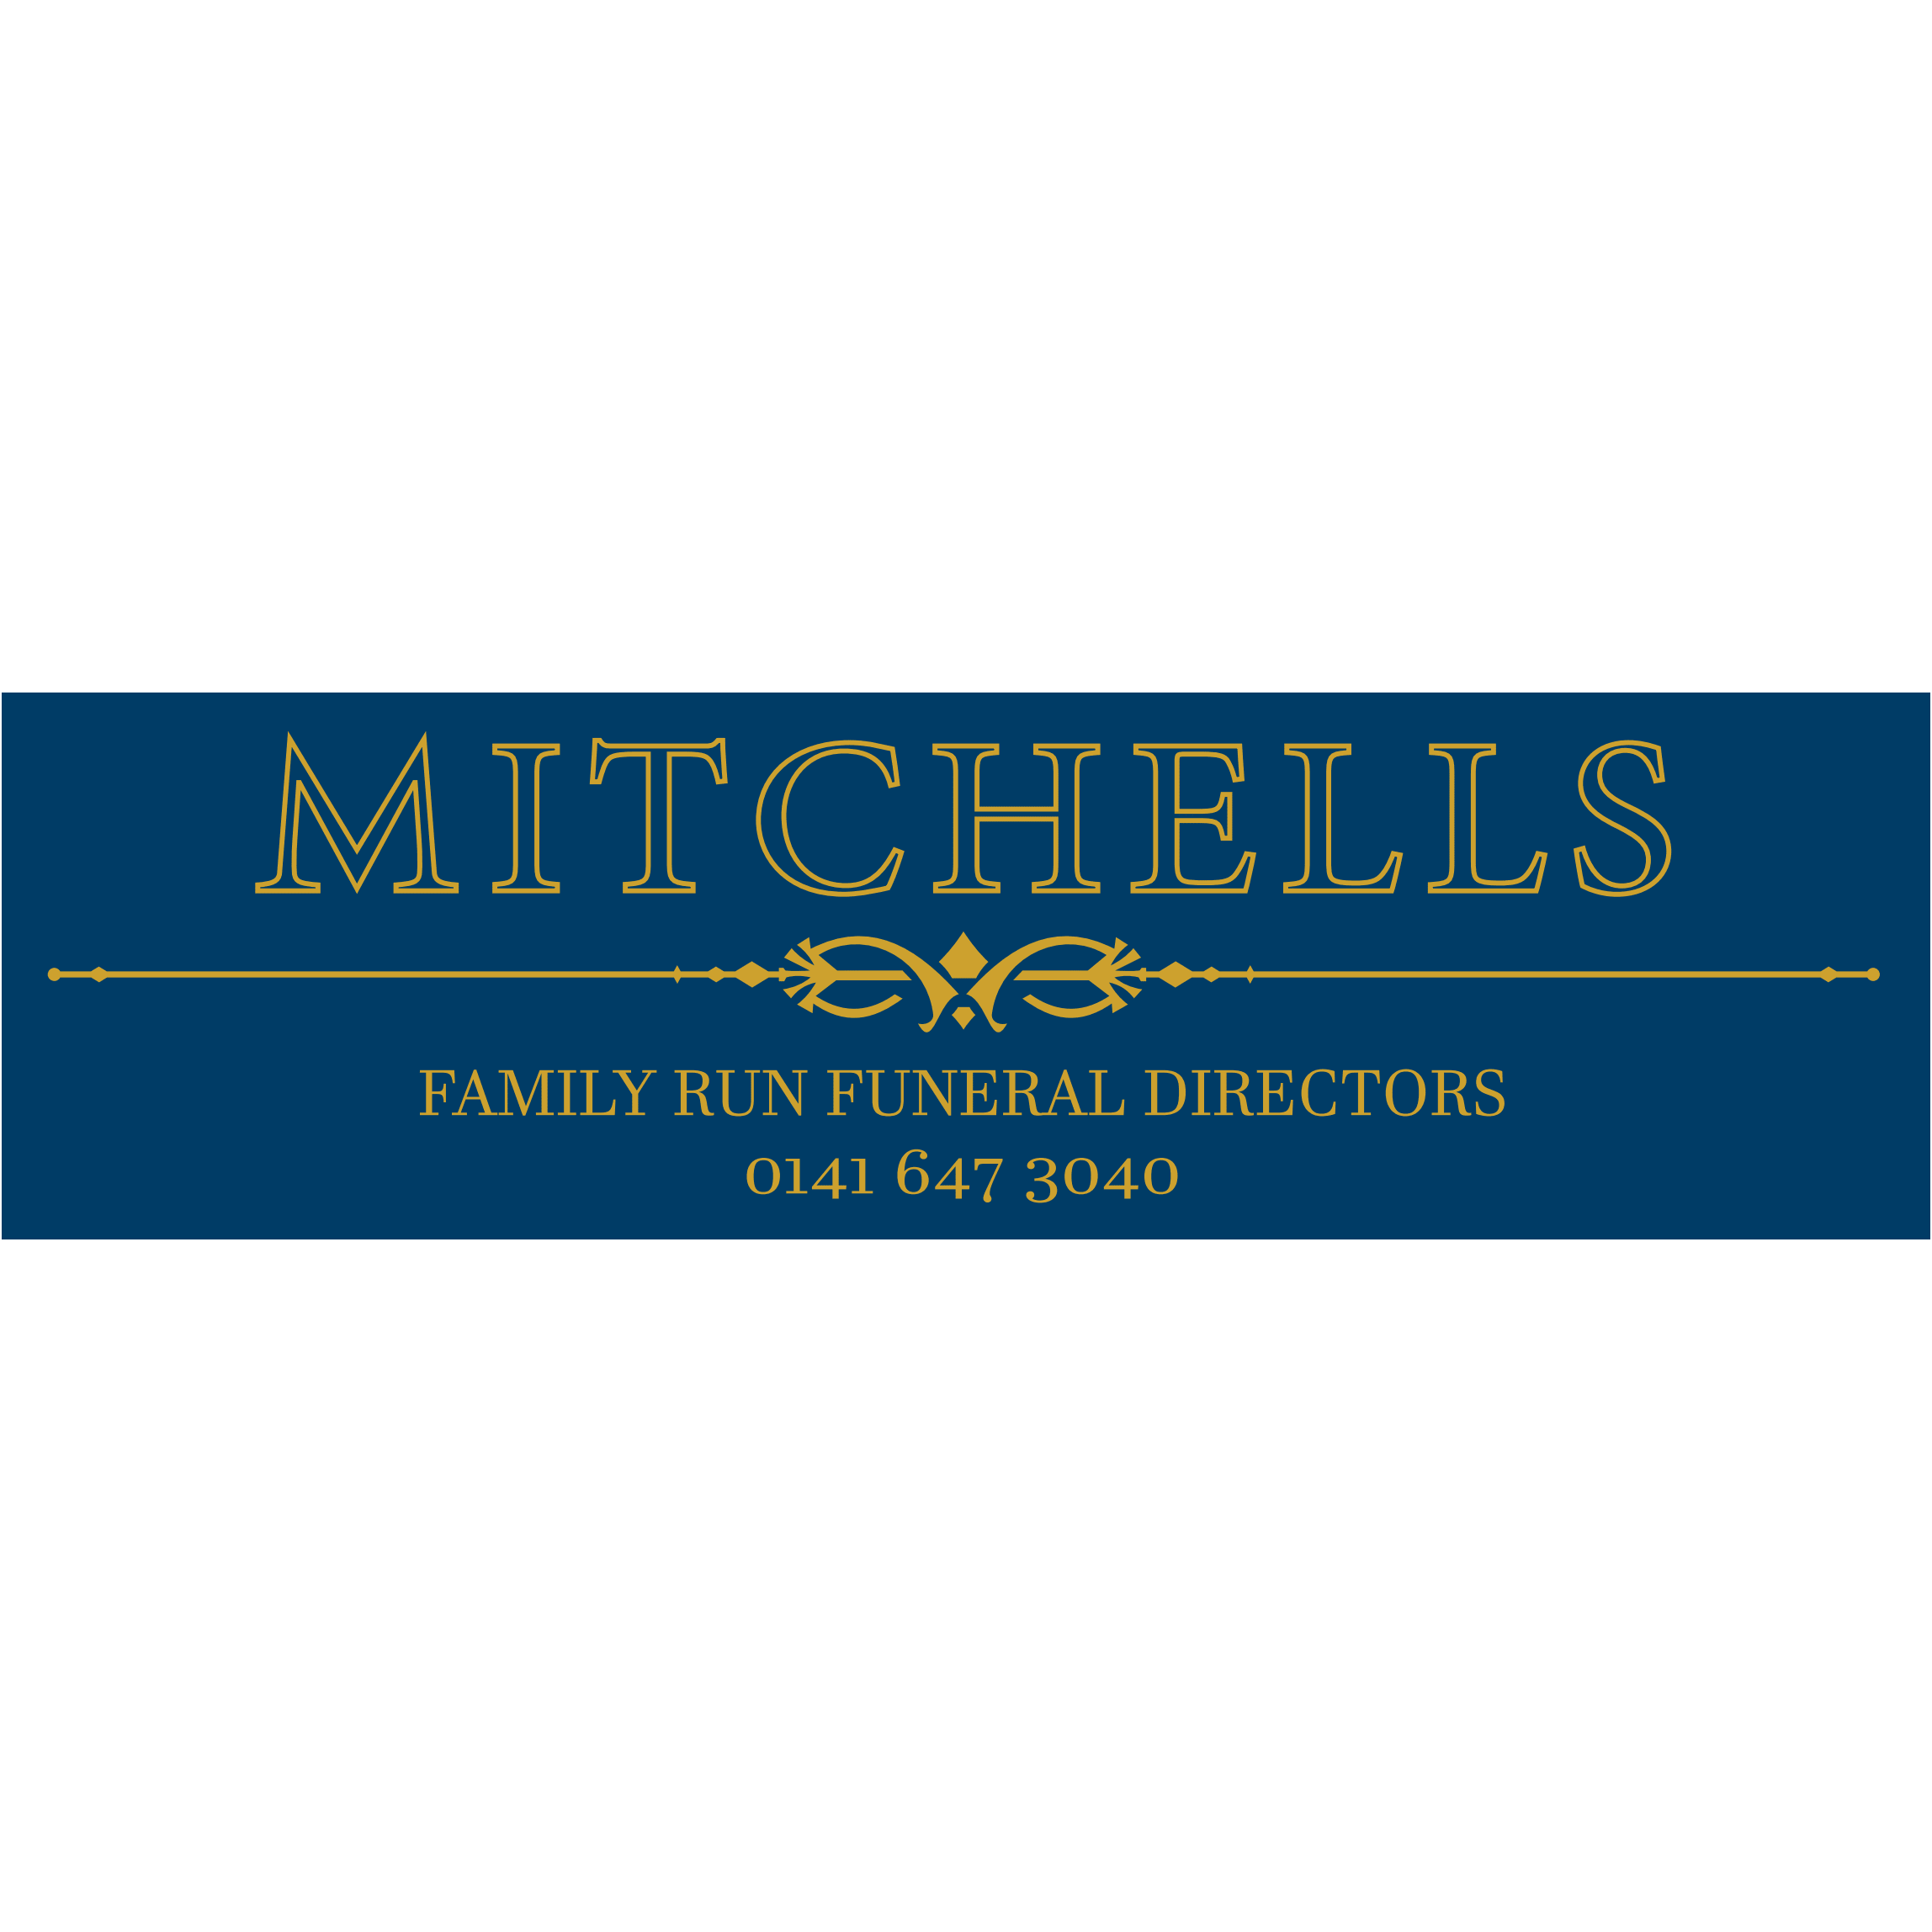 Mitchells Funeral Directors Ltd - Glasgow, Lanarkshire G73 3TW - 01416 473040 | ShowMeLocal.com